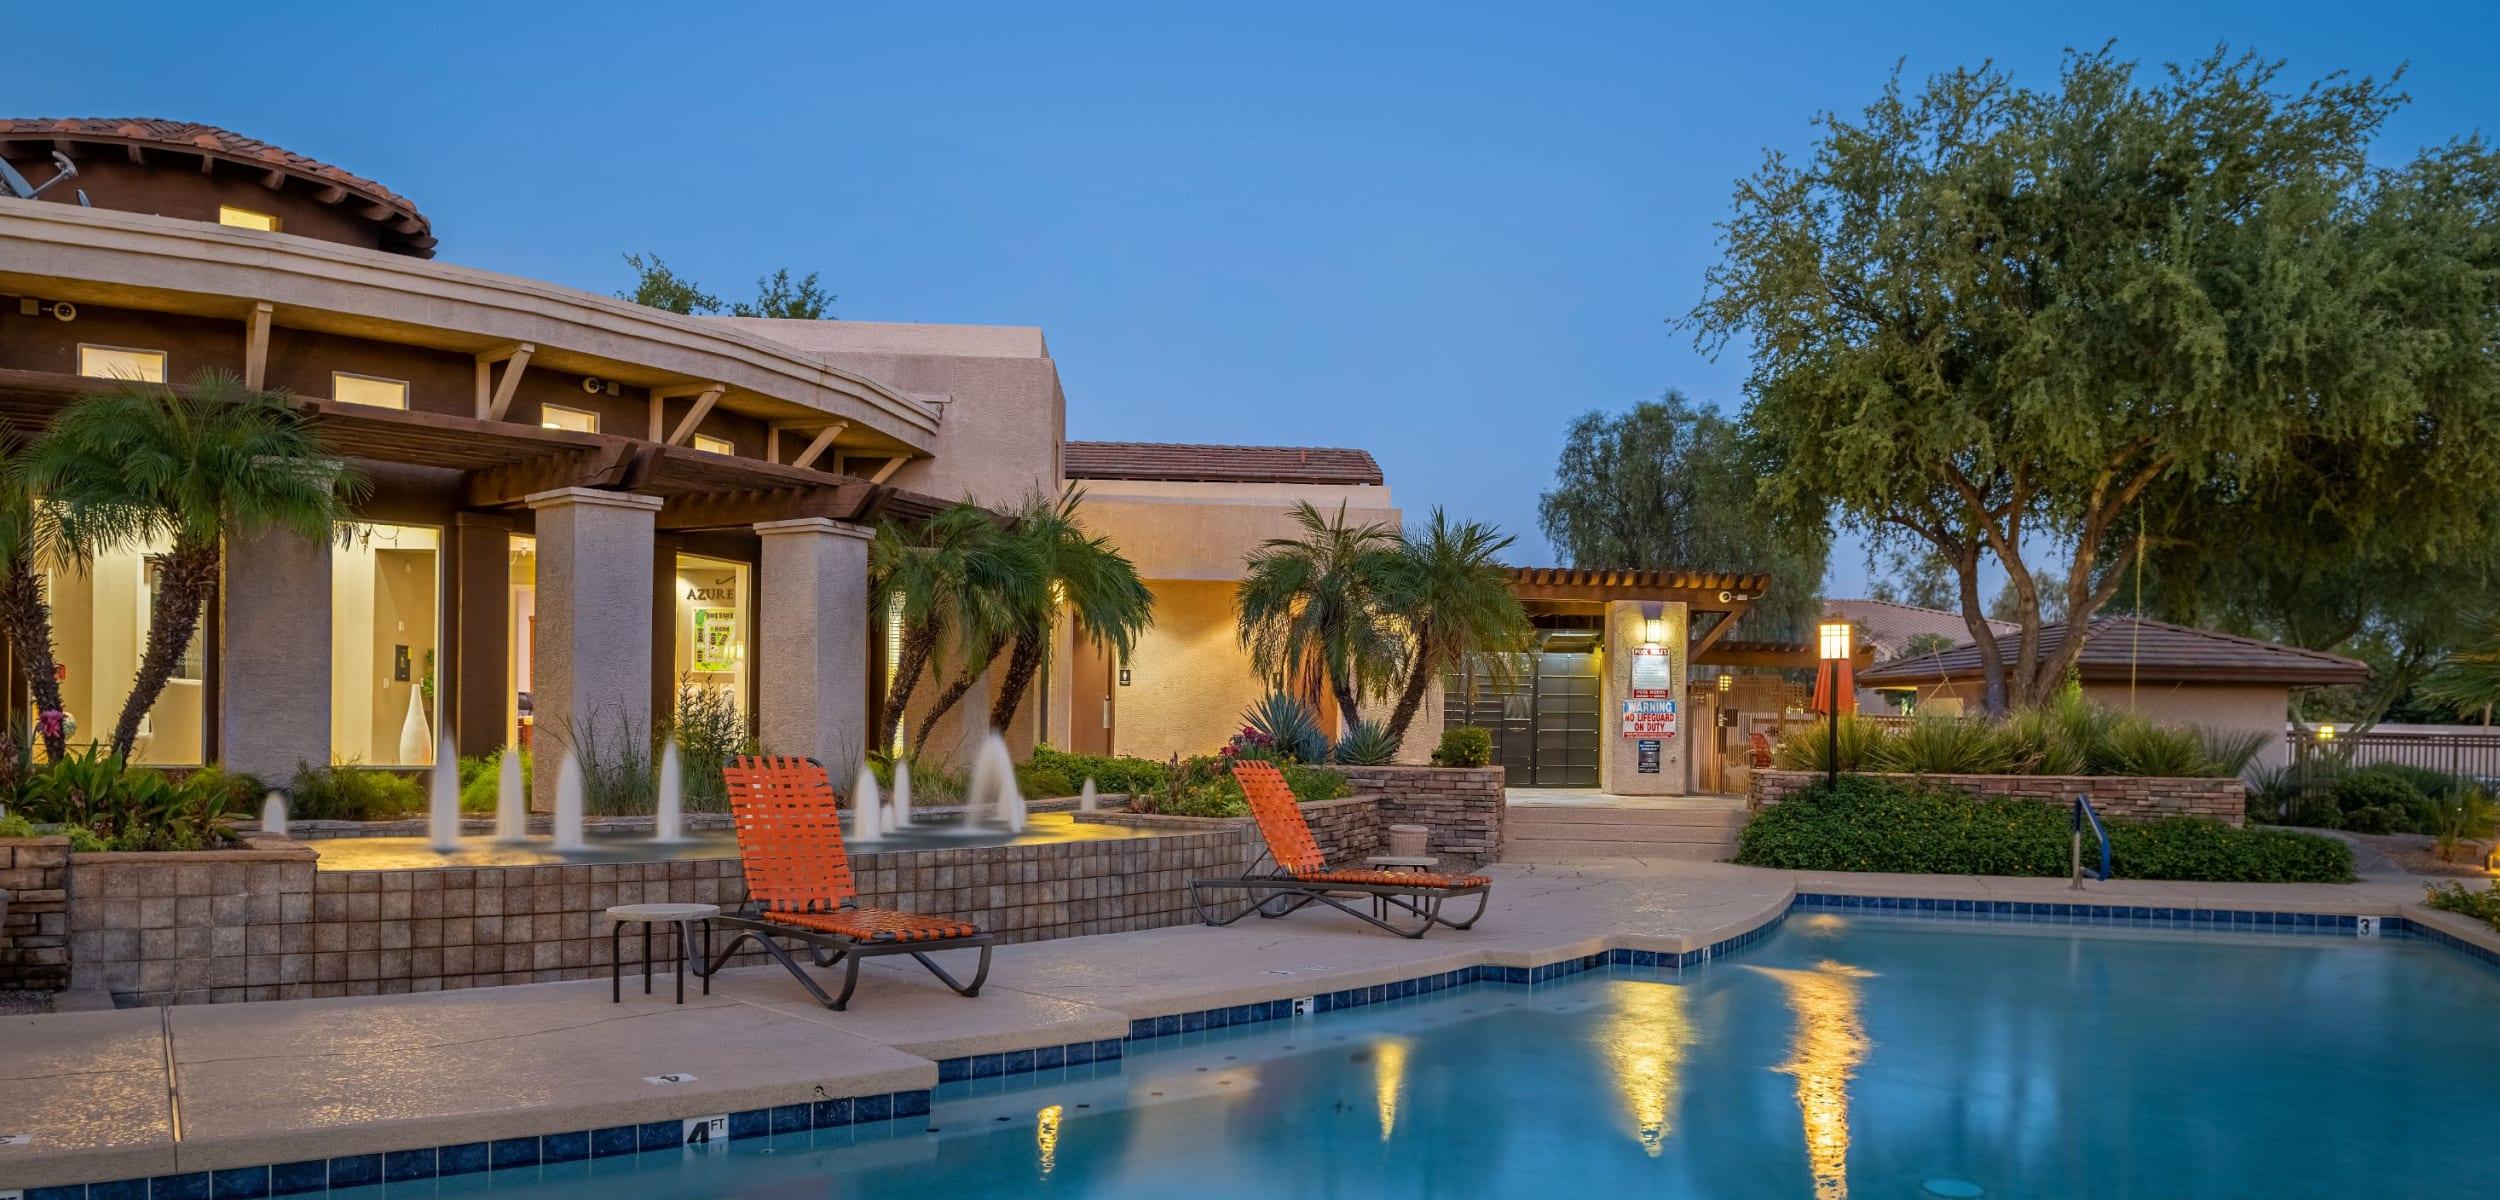 Resort style pool with sun chairs at Azure Creek in Cave Creek Arizona,